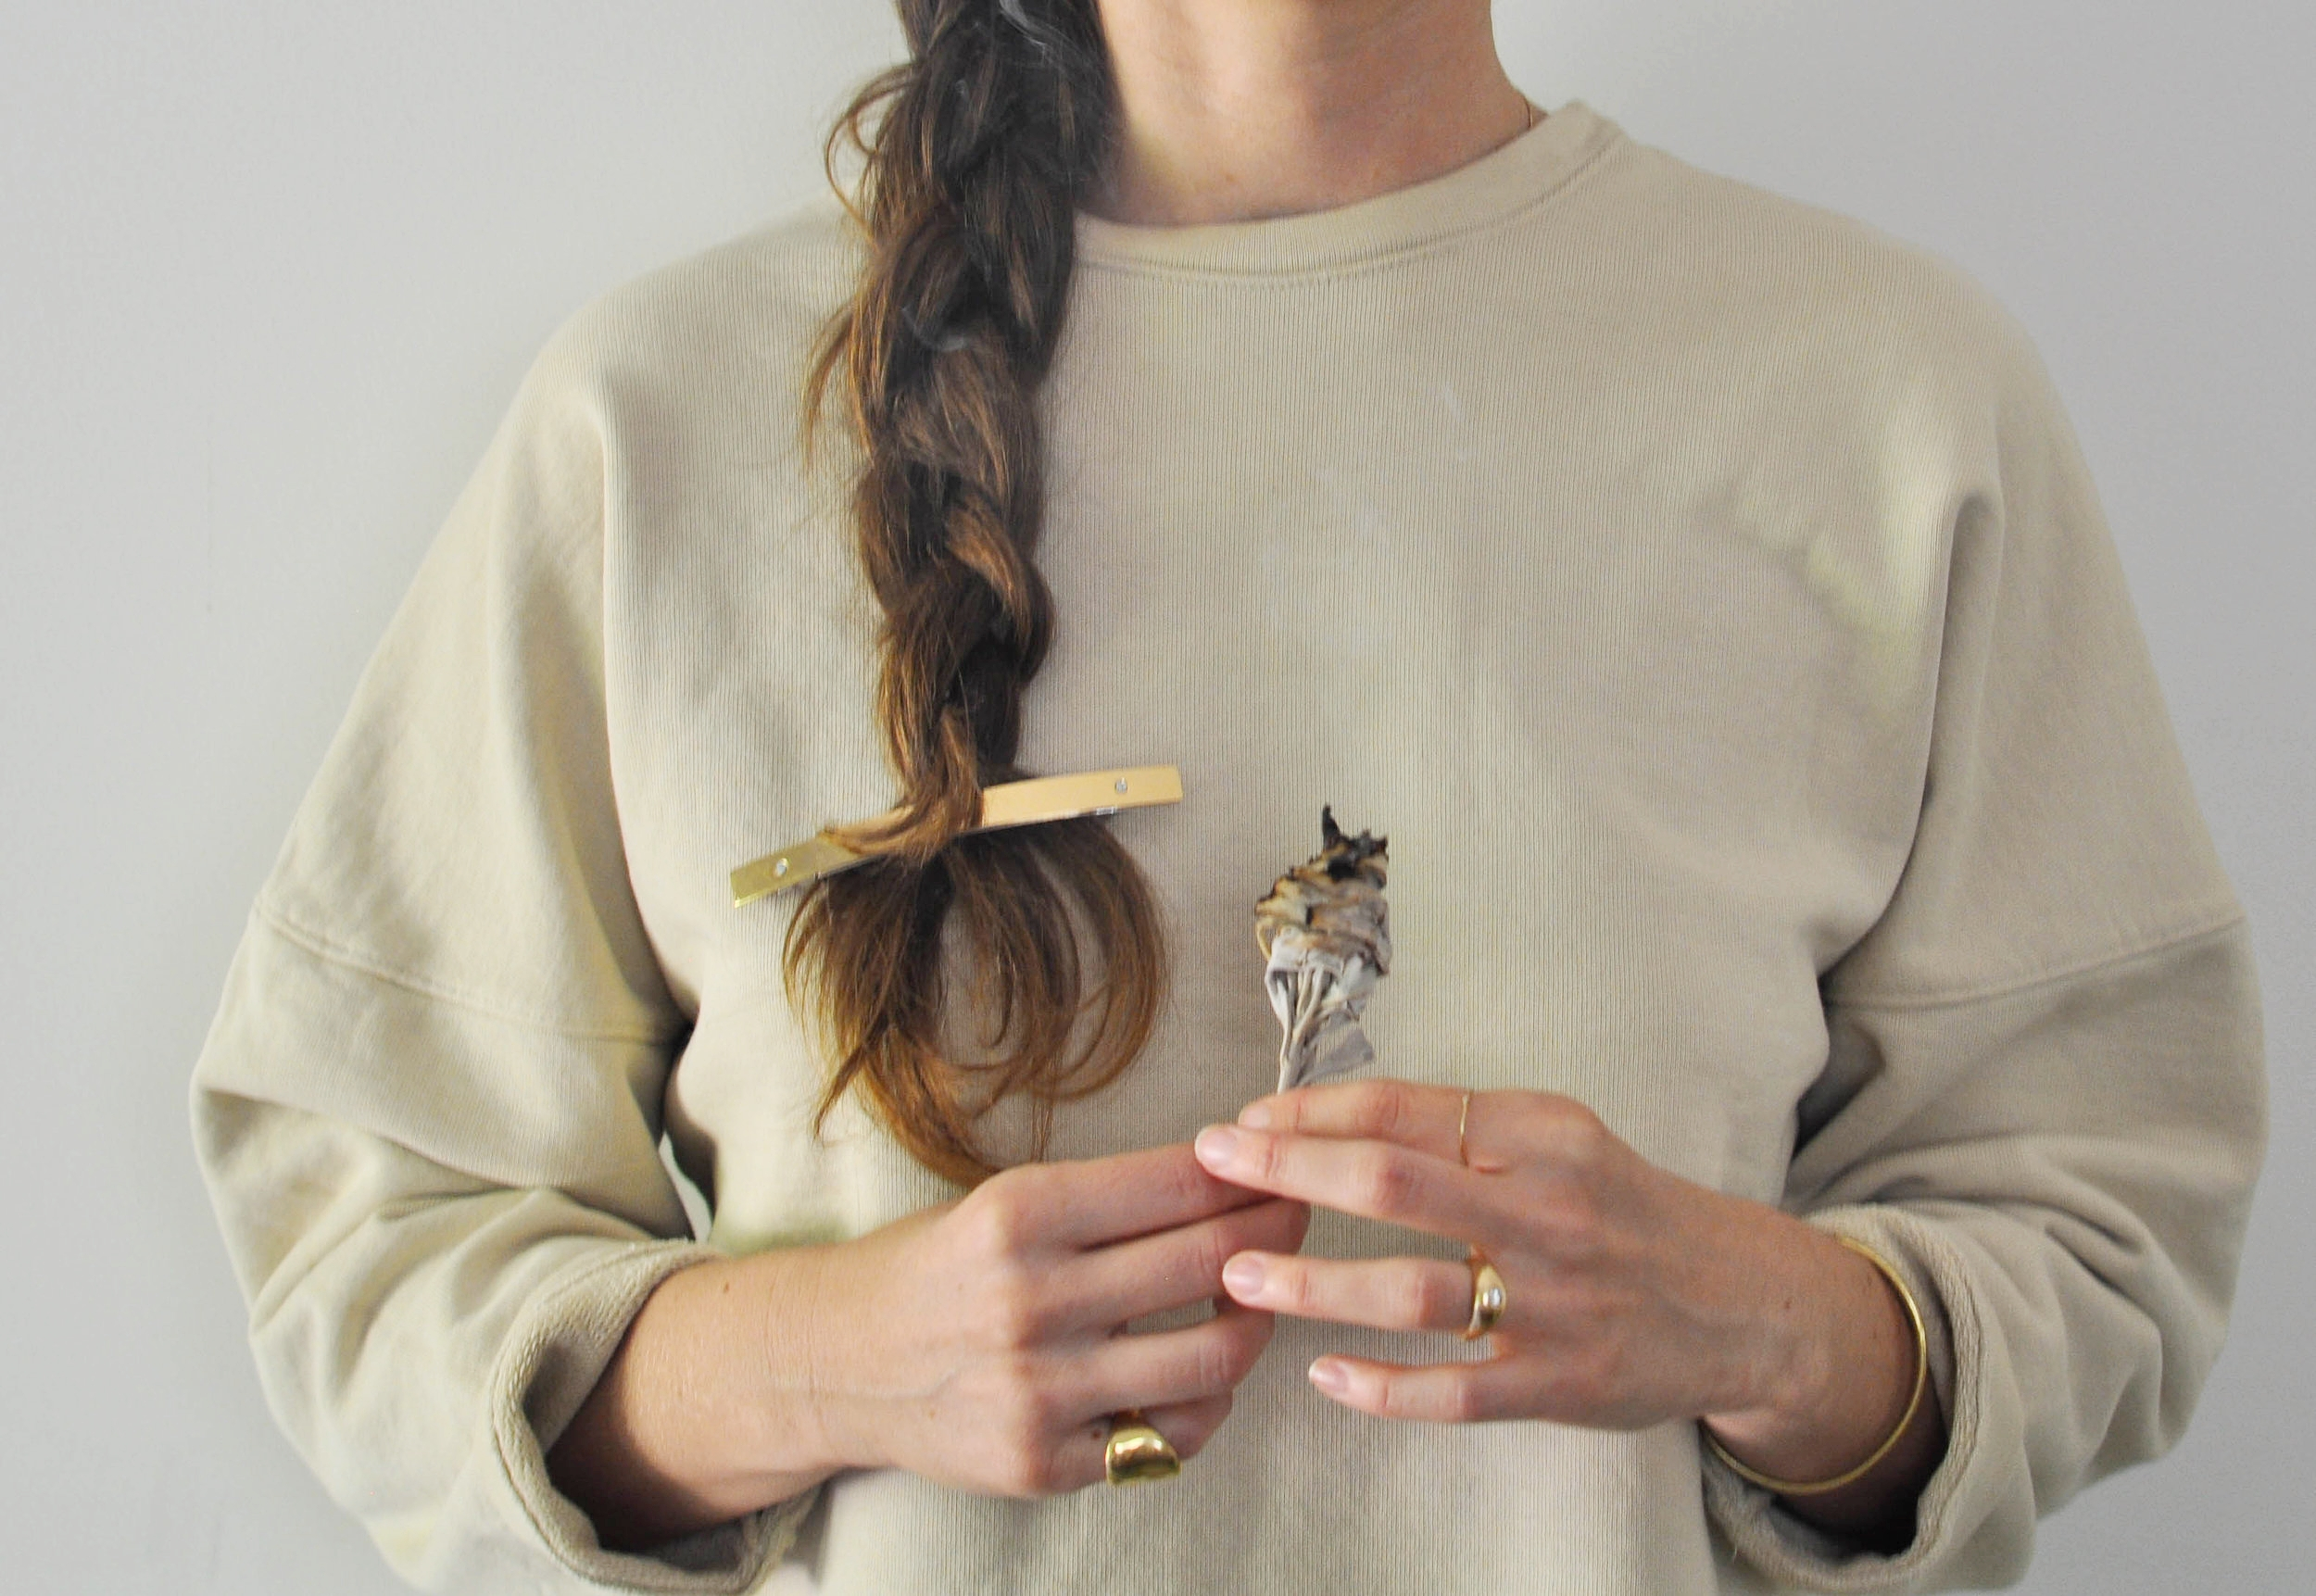 free-and-native-November_Sweater_Sage_Hairclip_pinkyring_bracelet_ring_braid 2 (1 of 1).jpg